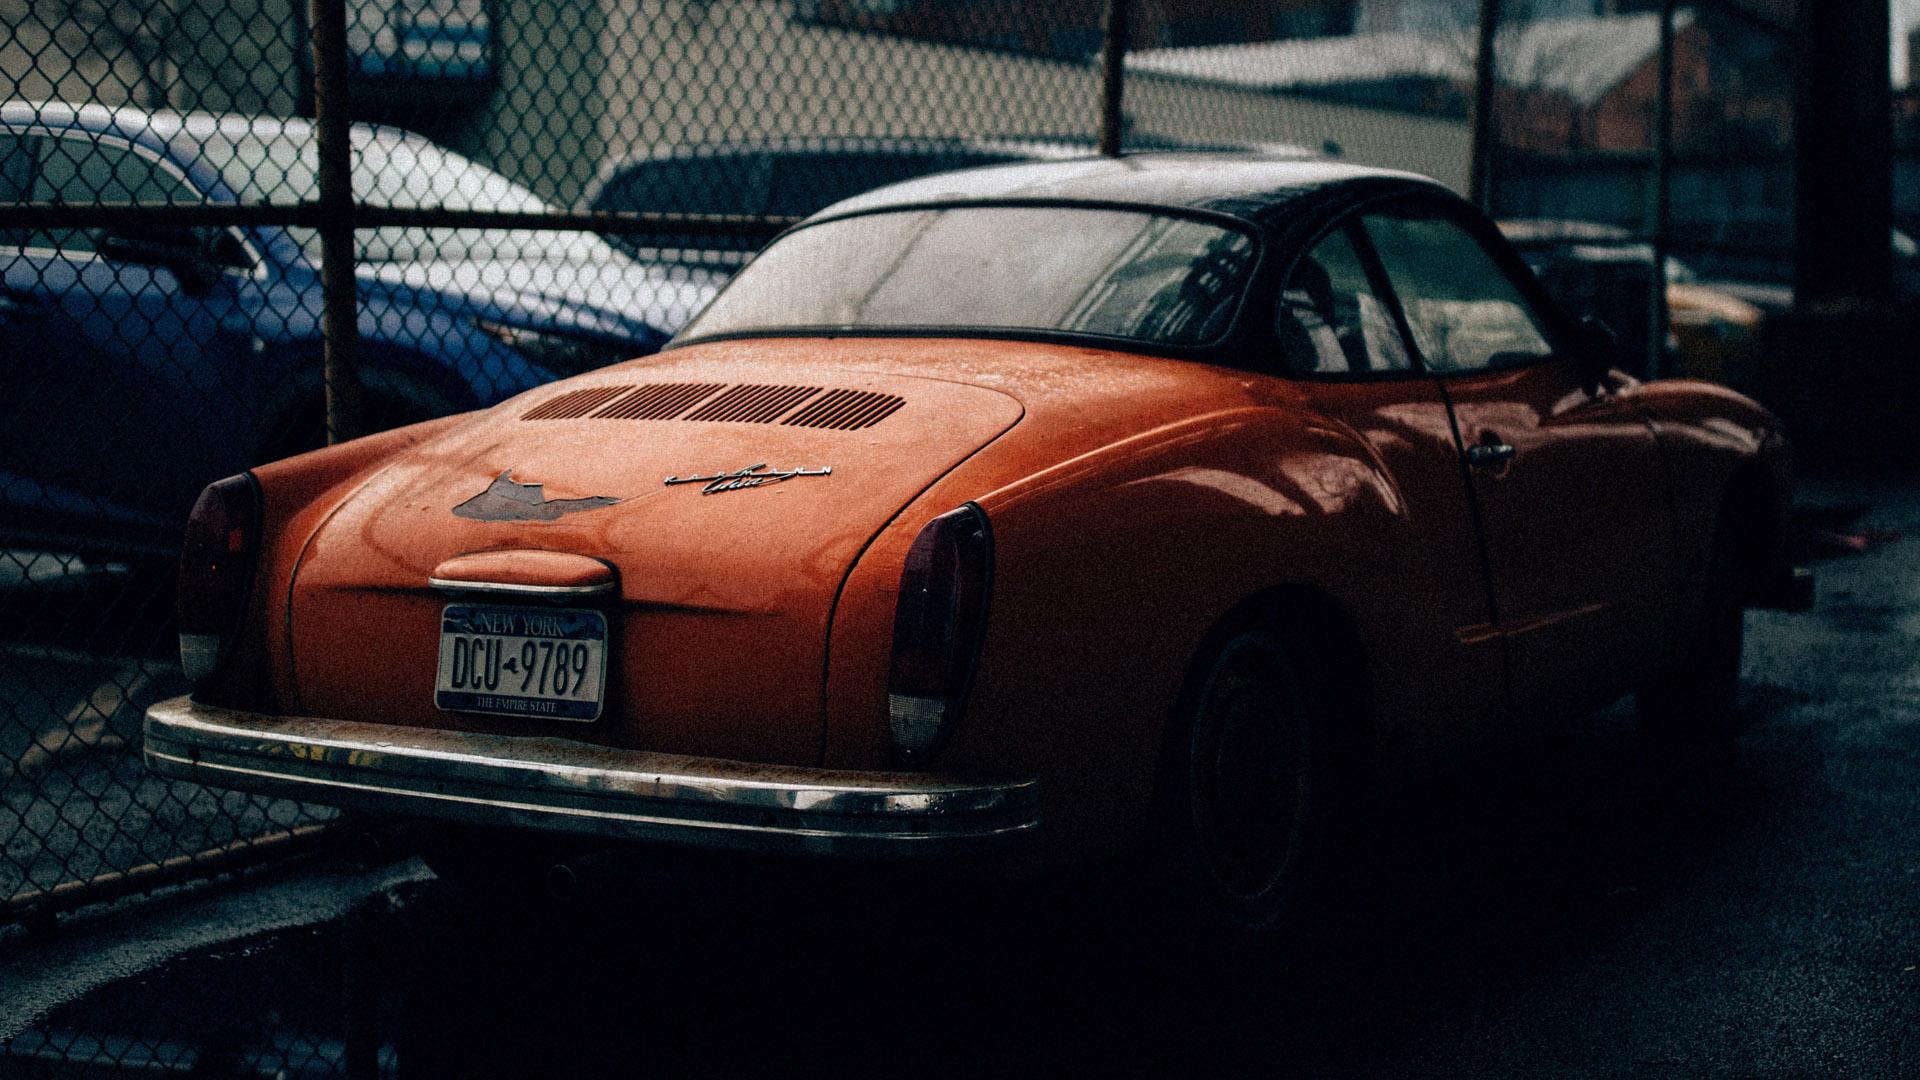 Картинки автомобилей и машин на рабочий стол - сборка №12 6